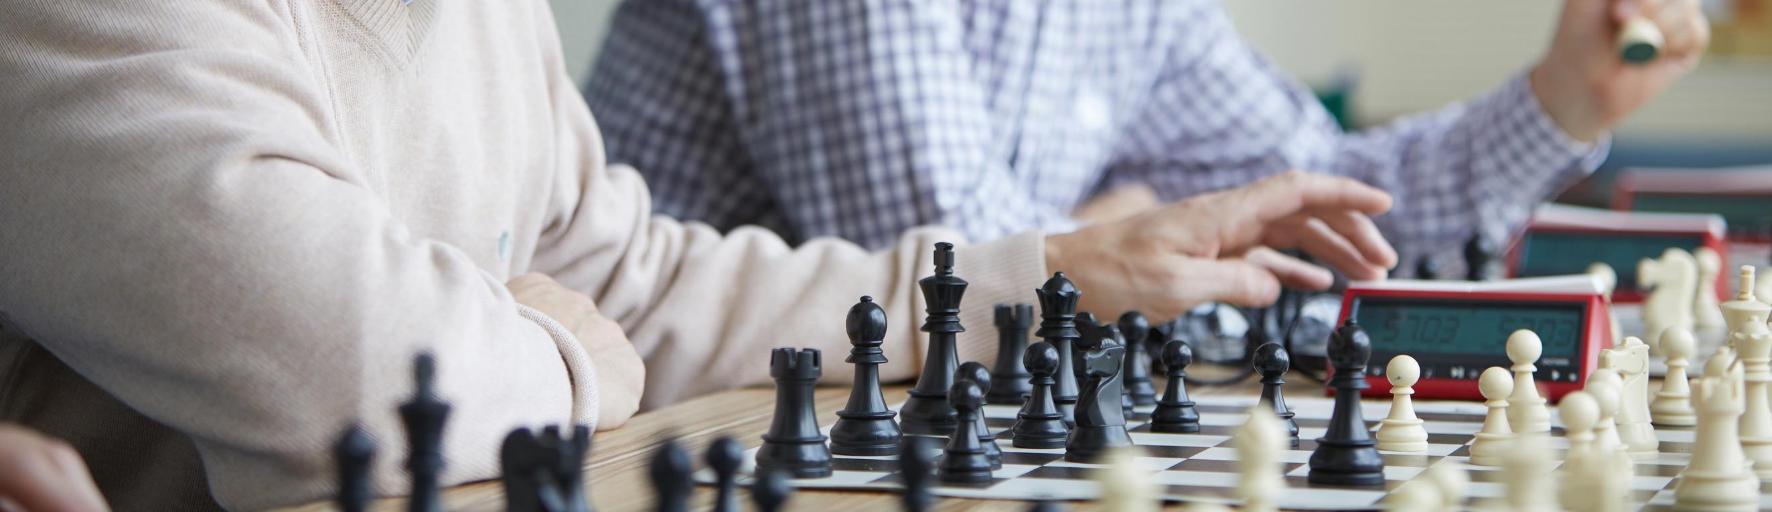 Club d'échecs du 92